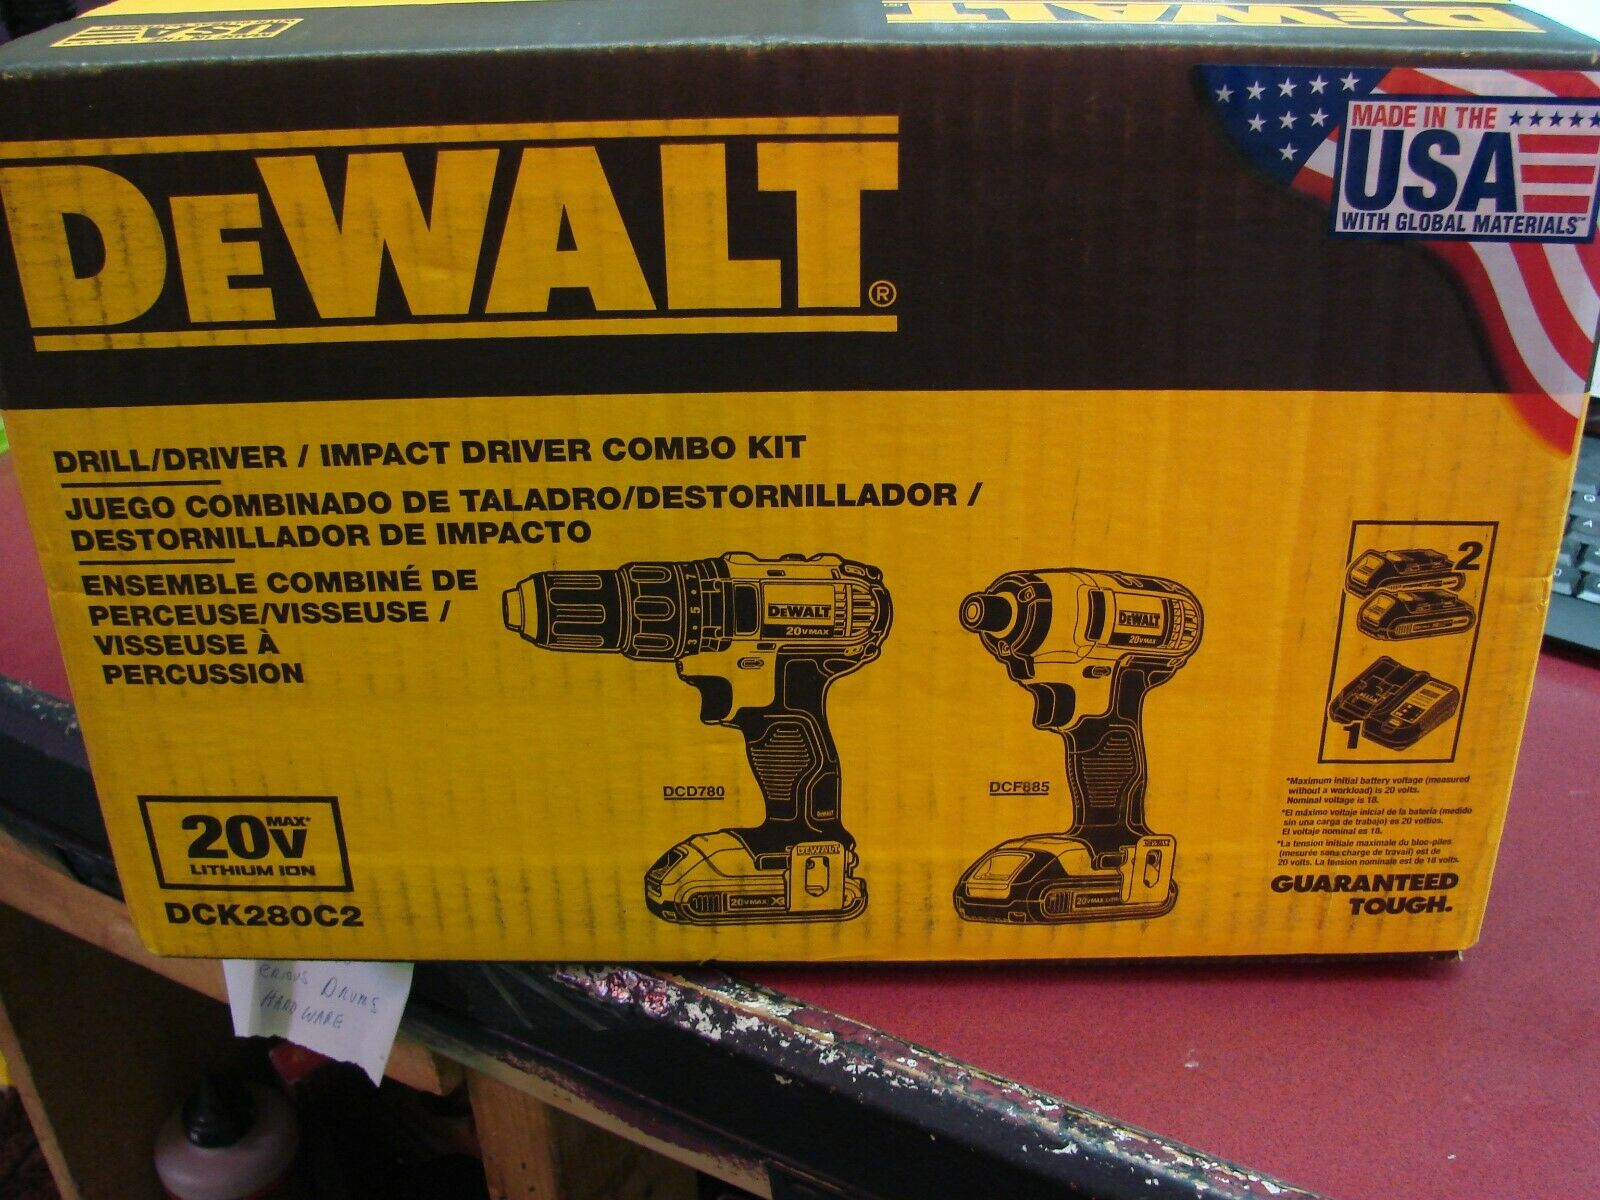 Dewalt DCK280C2 20V MAX Cordless Lithium-Ion 1/2 in. Compact